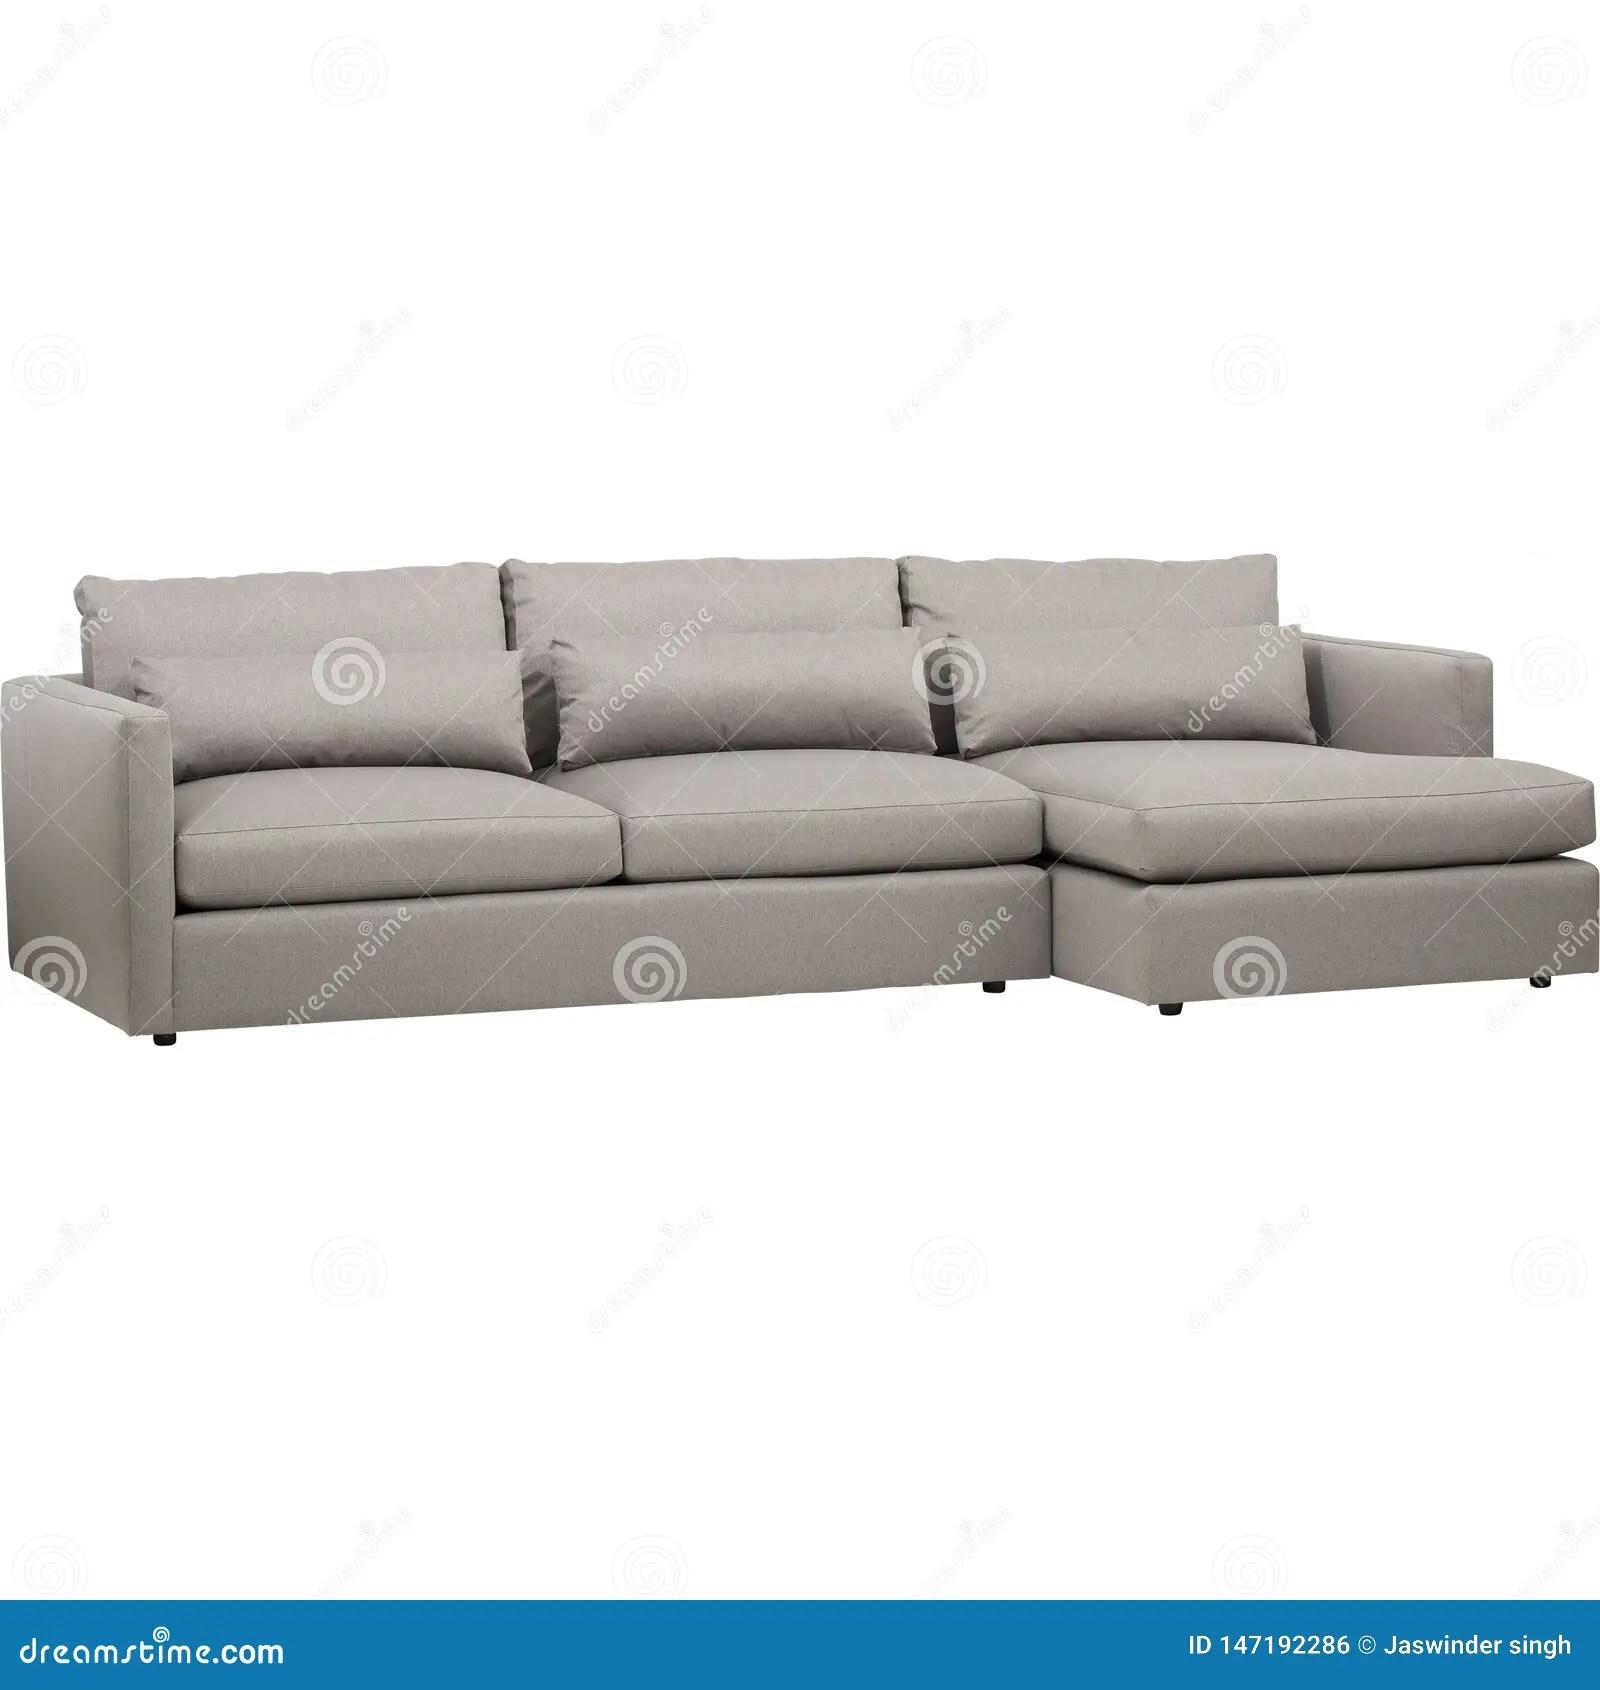 Sofa Bed Italian Design | Modern Furniture Beds Sofa Beds ...